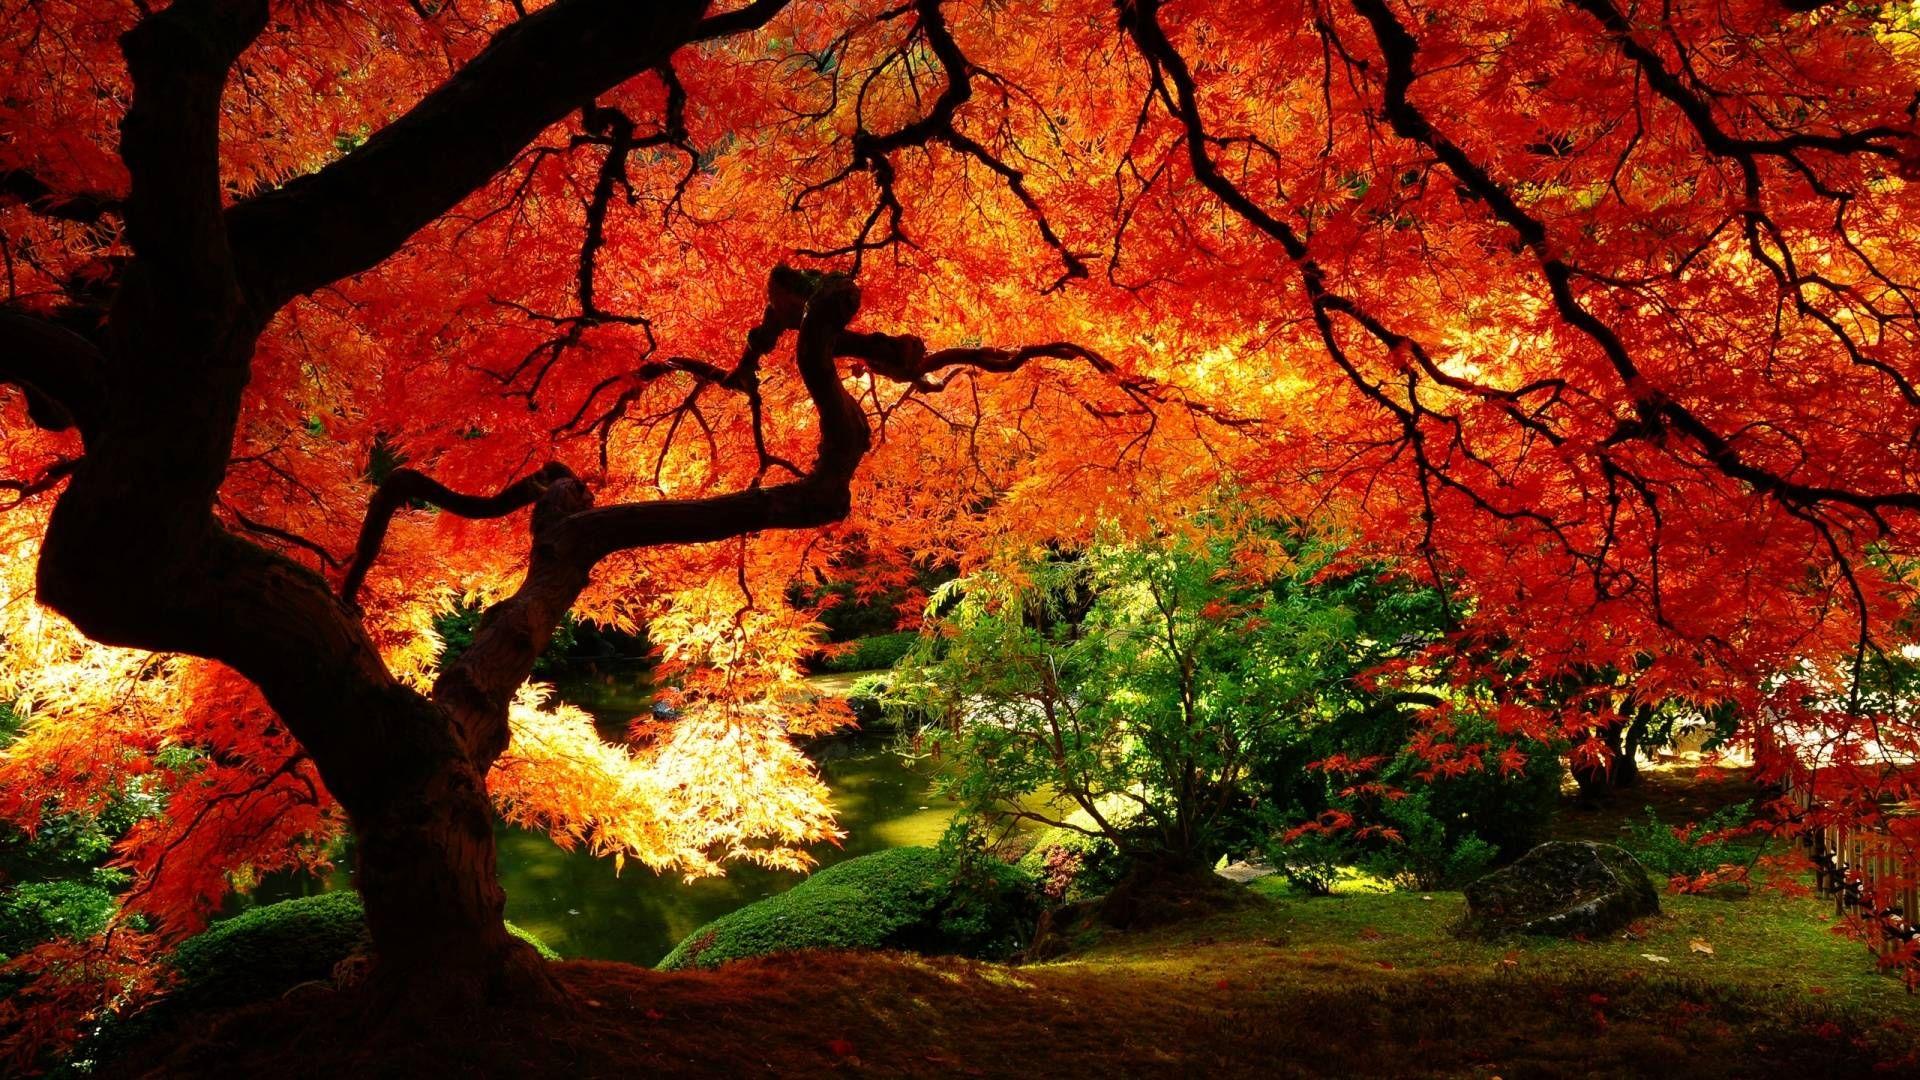 3d Fall Wallpapers Wallpaper Cave Autumn Scenery Landscape Wallpaper Scenery Wallpaper